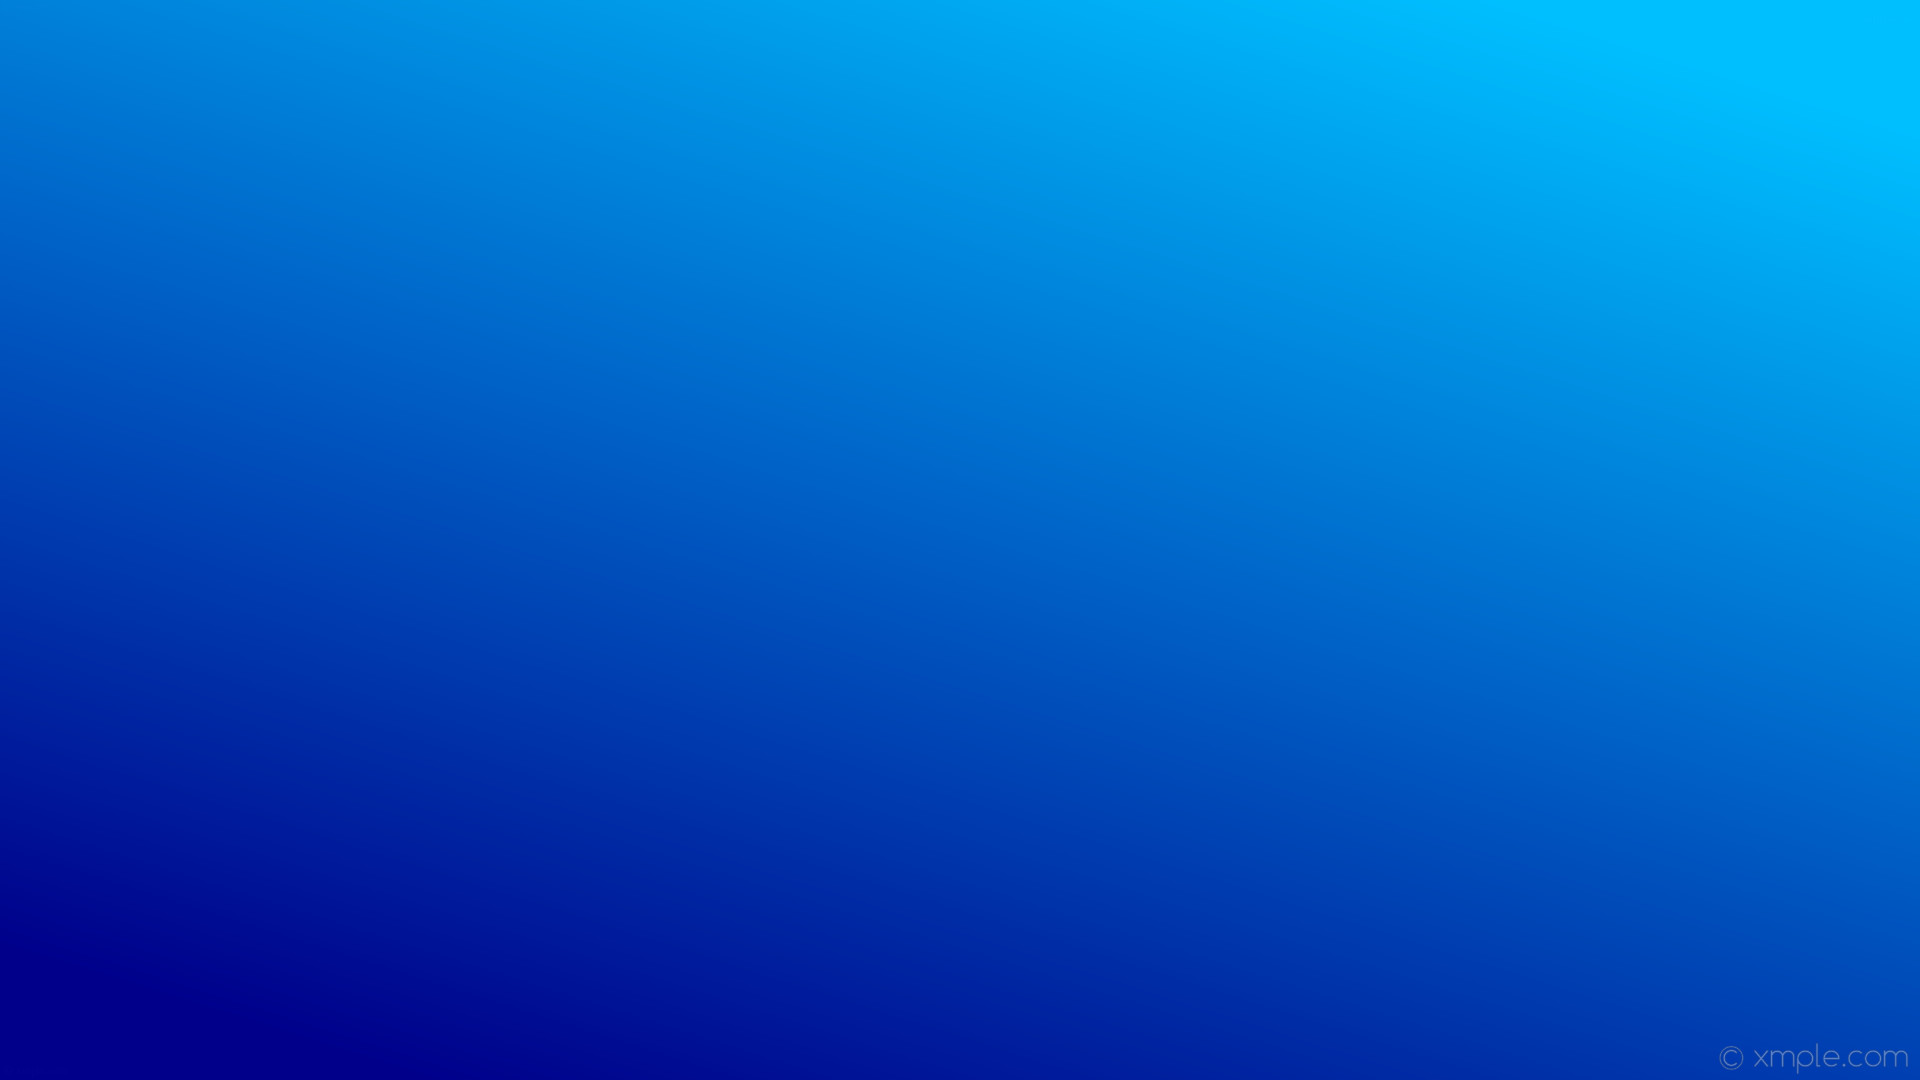 wallpaper linear blue gradient dark blue deep sky blue #00008b #00bfff 225°